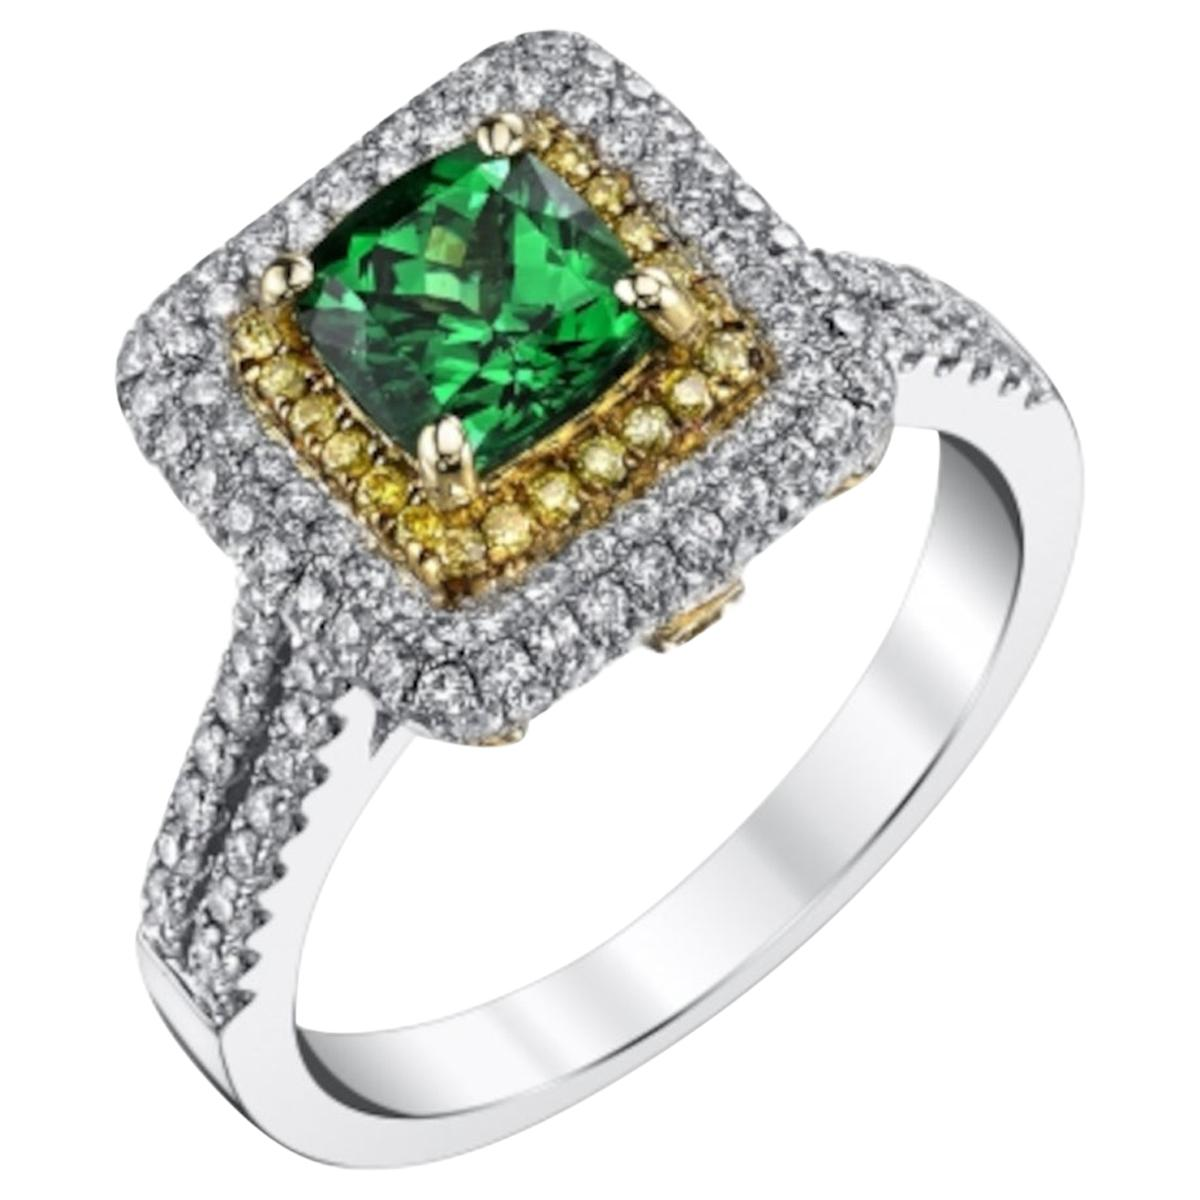 1.20 Carat Tsavorite Garnet, Yellow Diamond Halo, White, Yellow Cocktail Ring